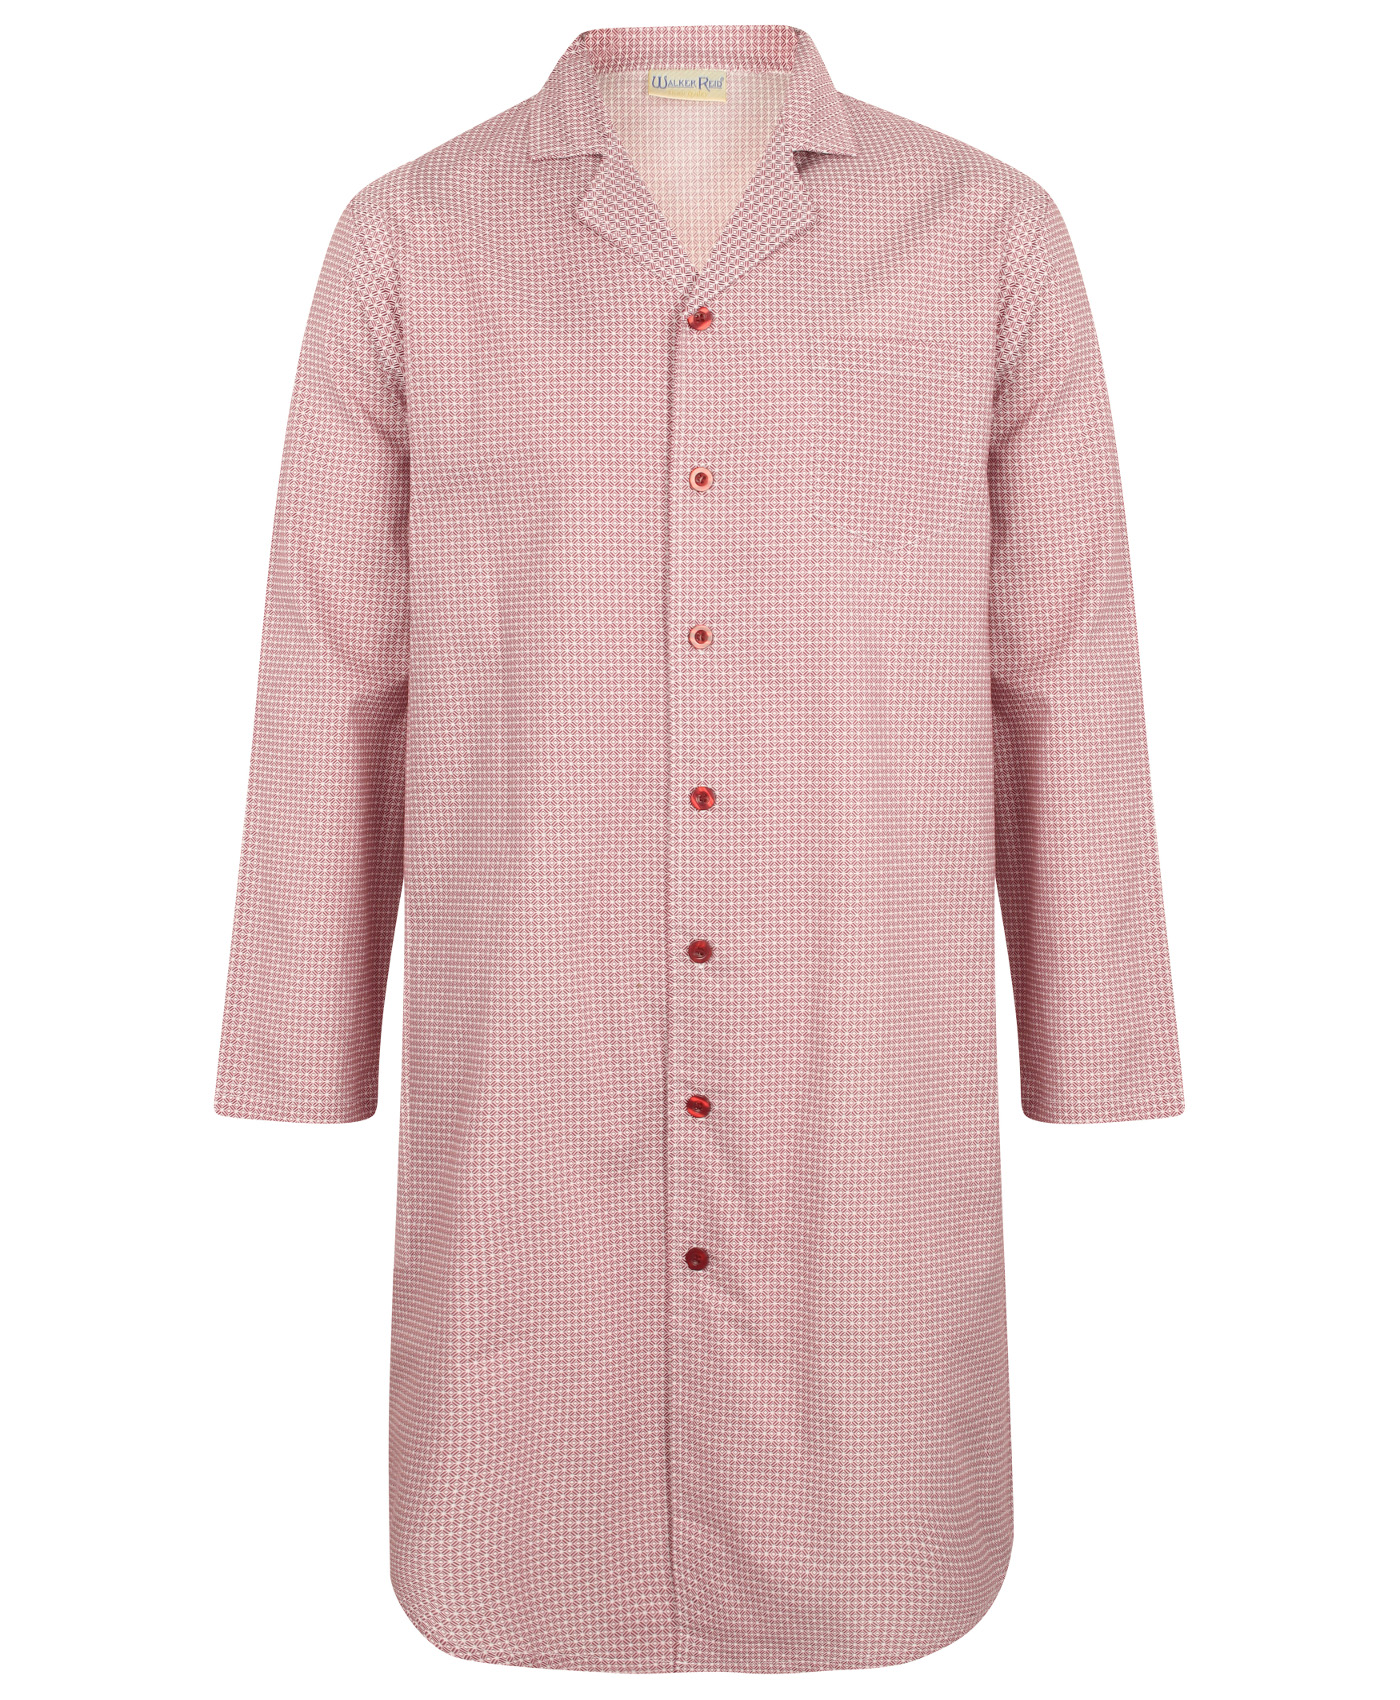 f12a0865a9 Night Shirt Geo Print Cotton Walker Reid Mens Button Up Traditional  Sleepwear